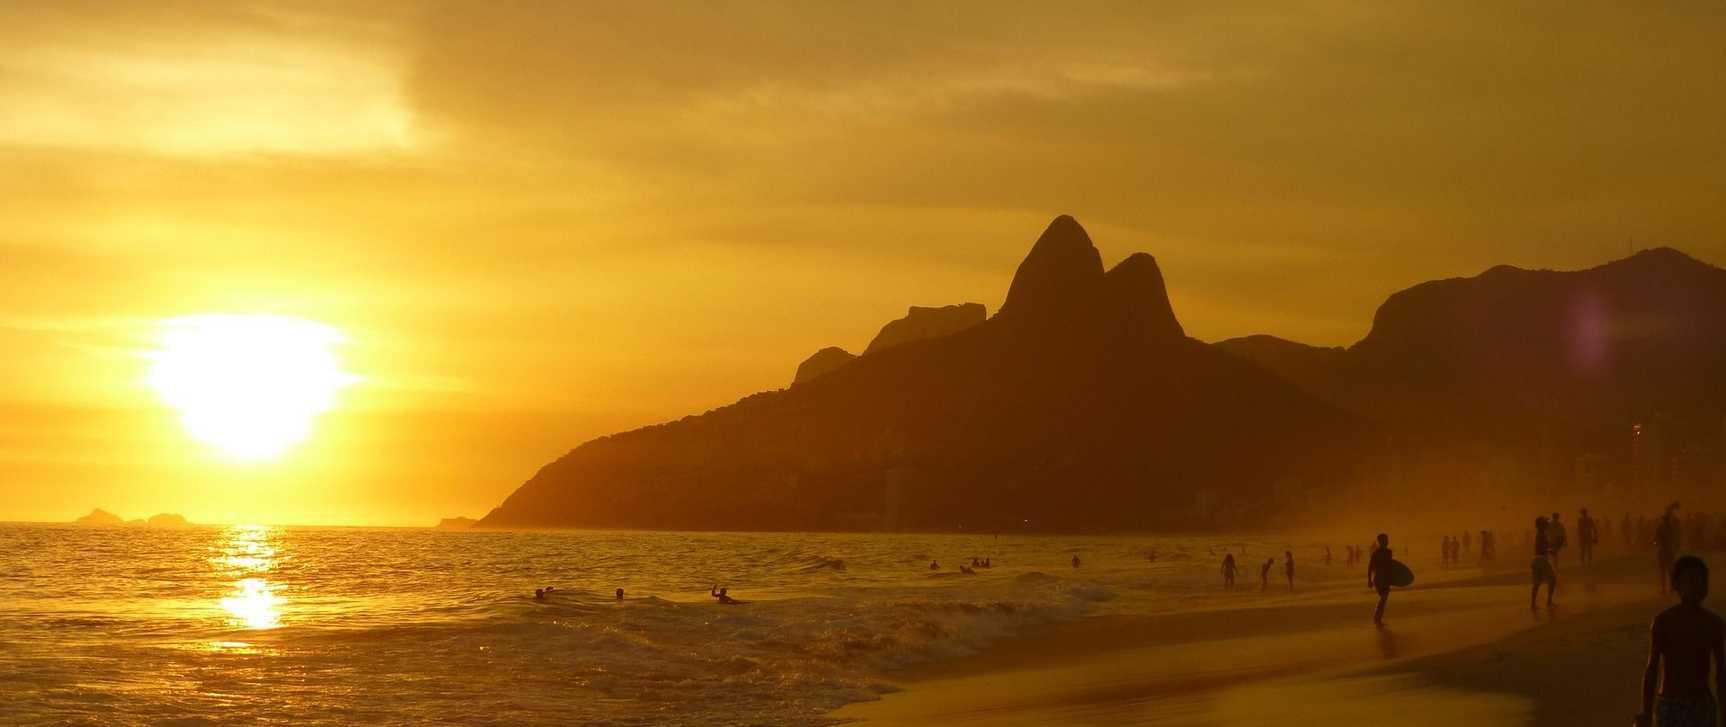 ipanema-beach-99388_1920.jpg.1726x727_default.jpg